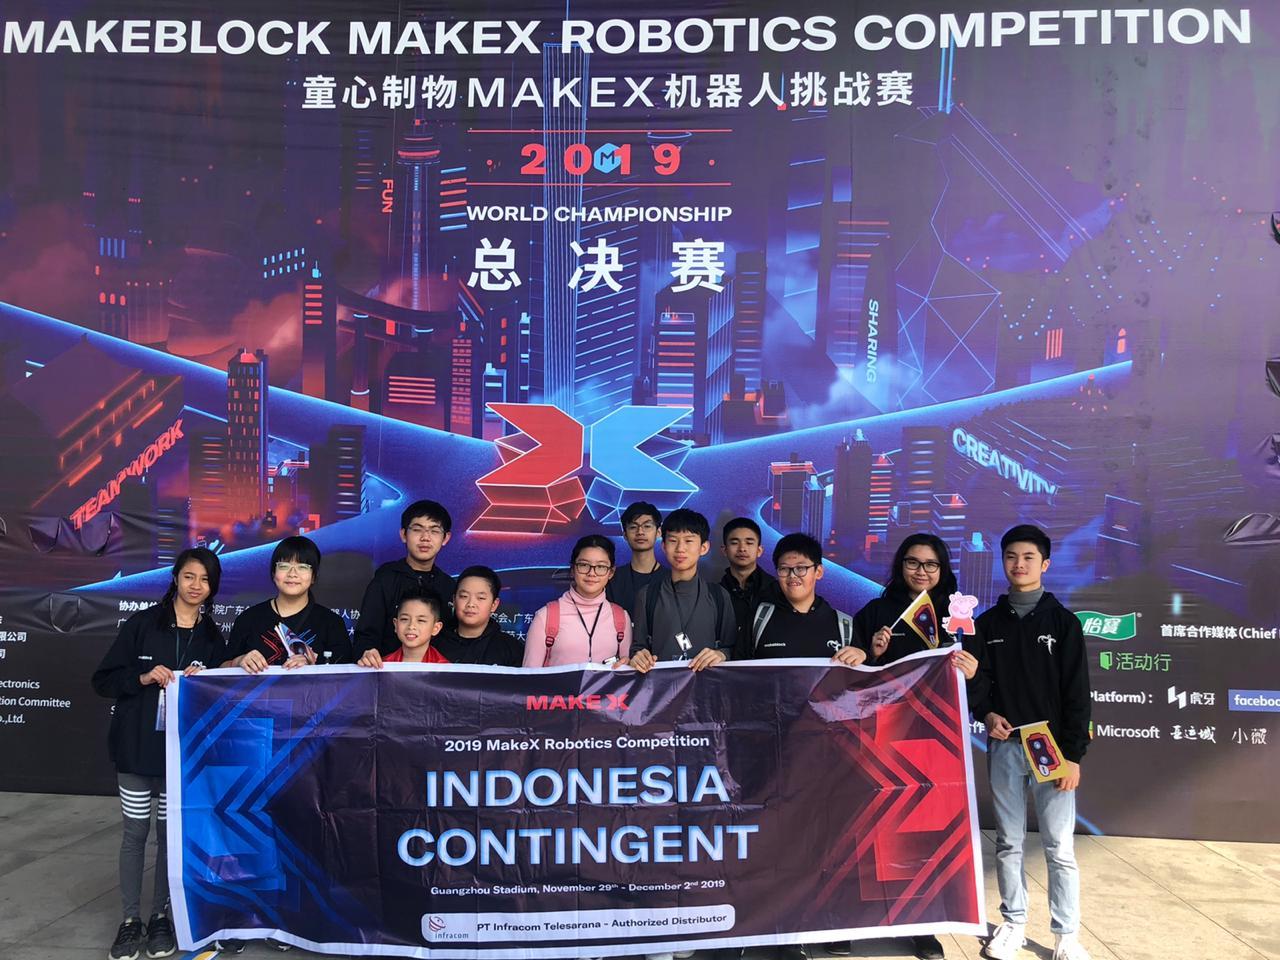 2019 MAKEBLOCK MAKEX ROBOTICS COMPETITION